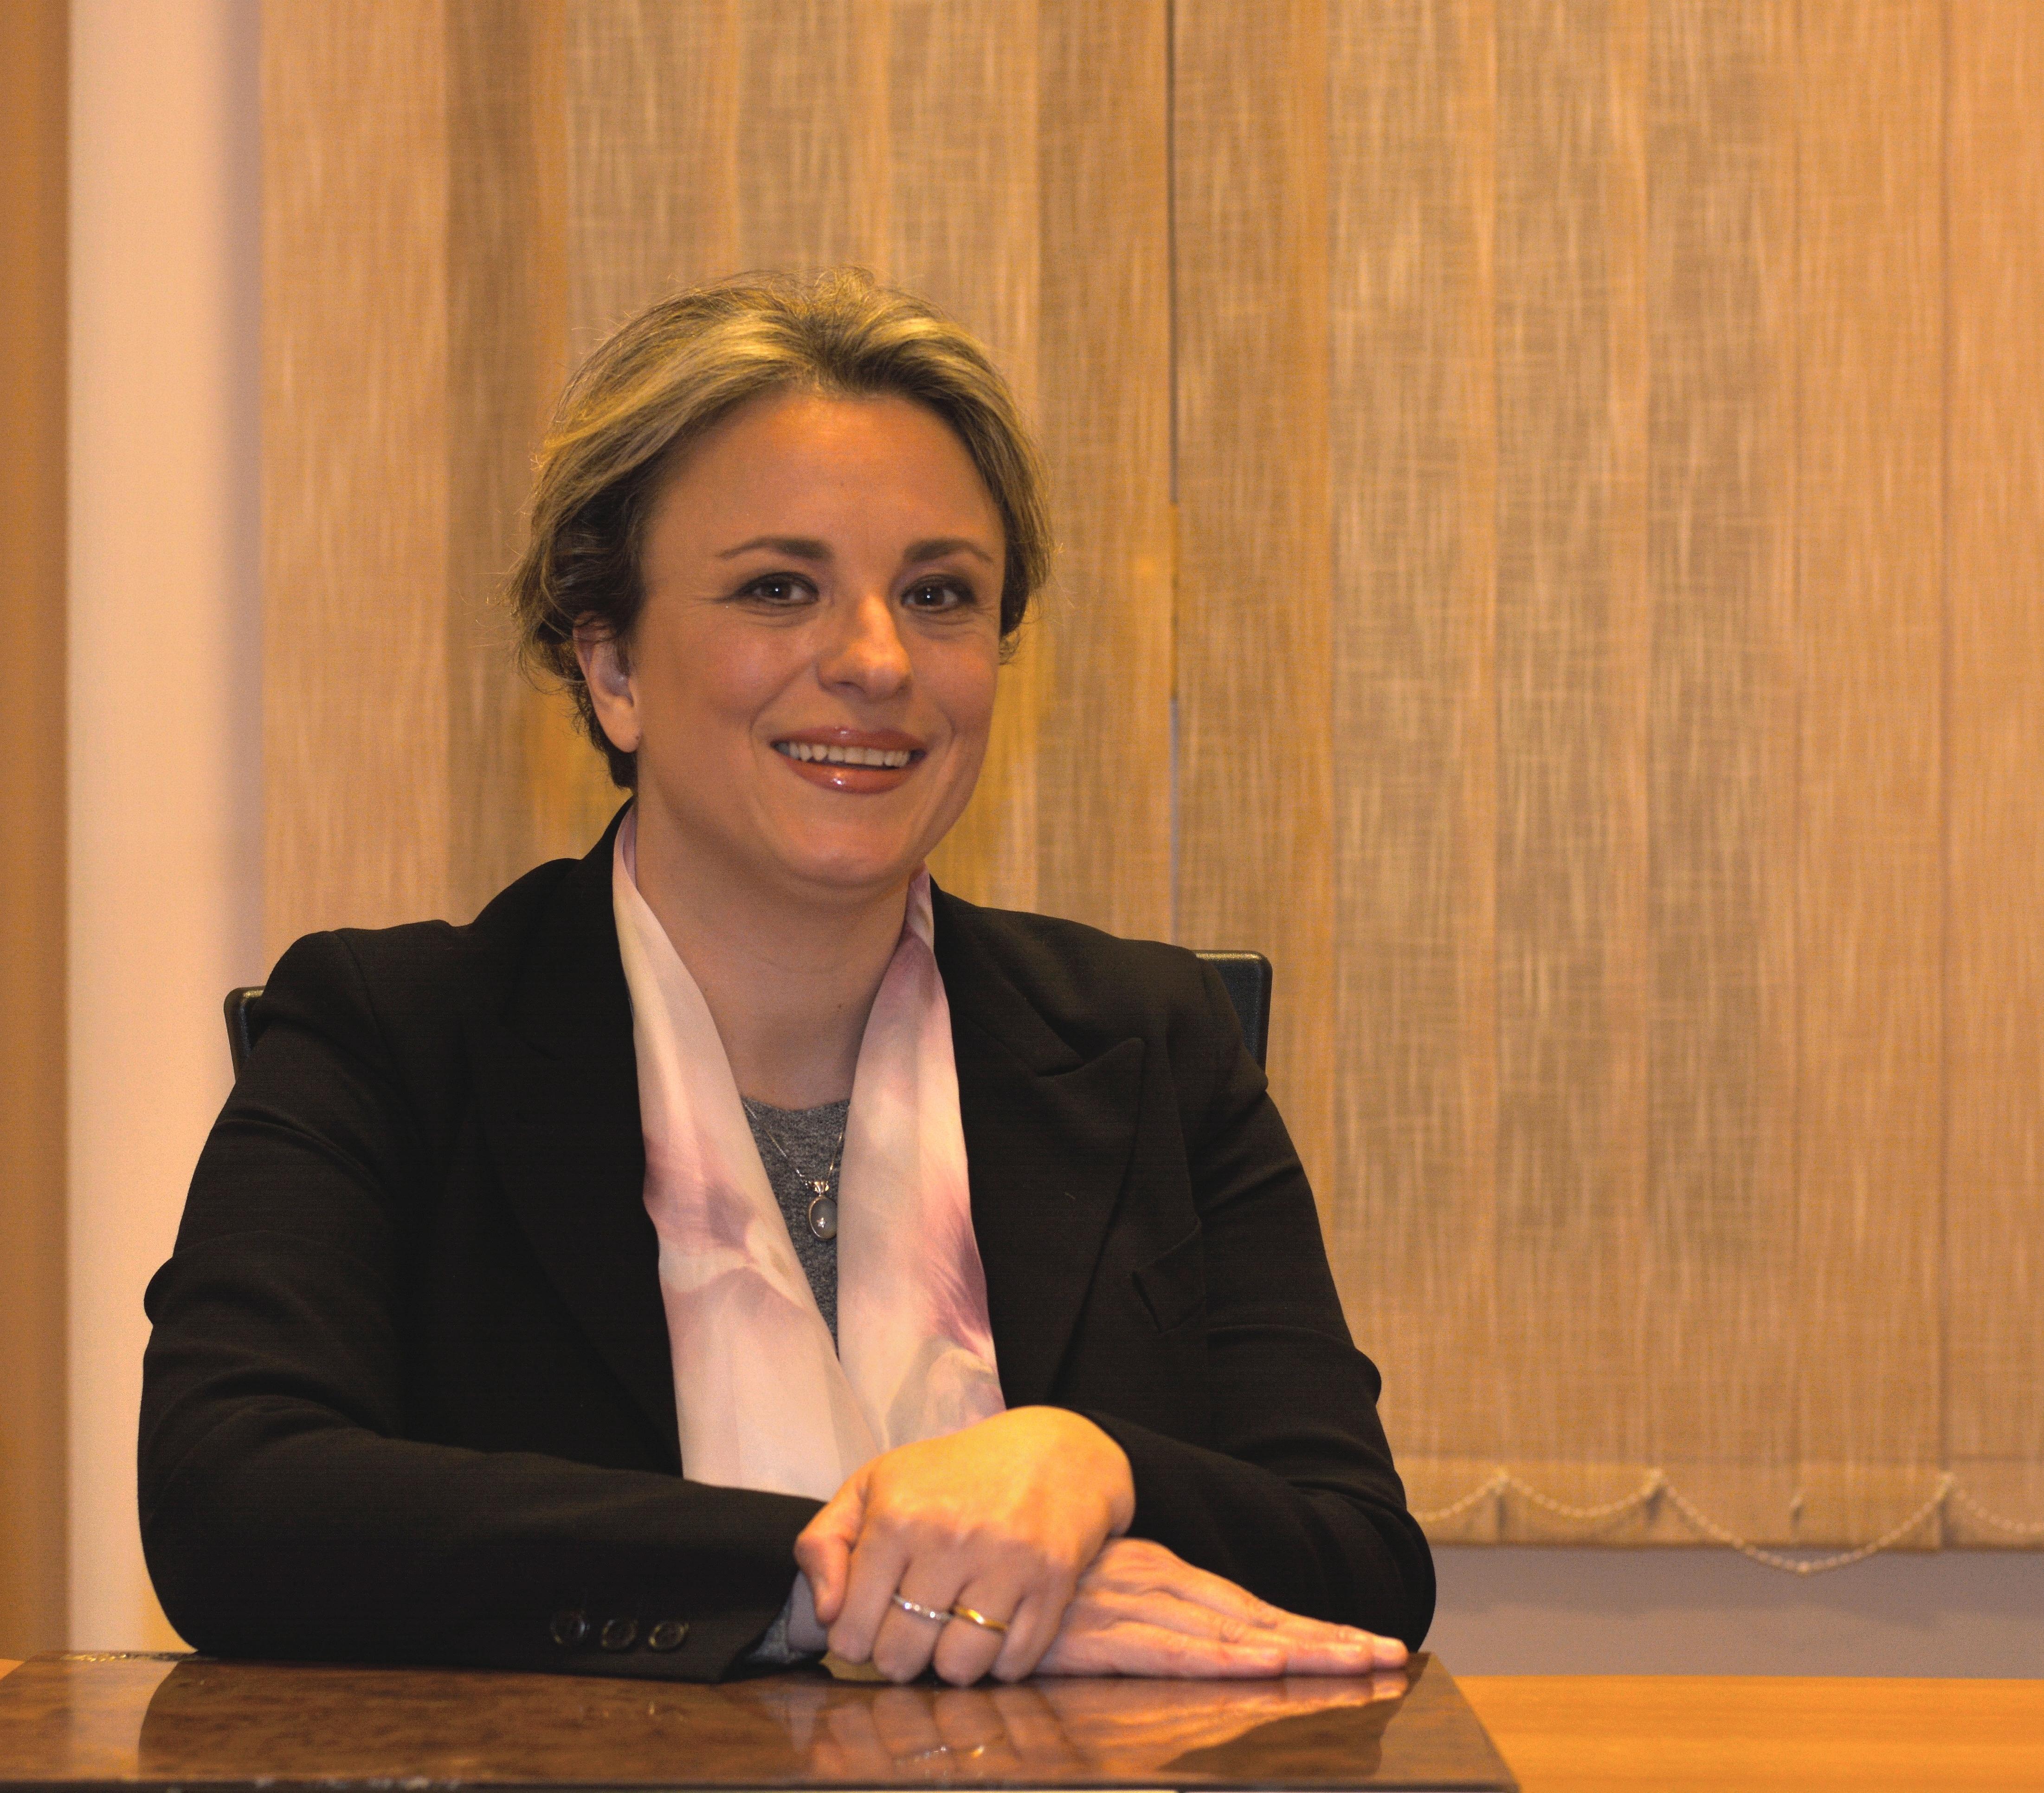 Avv. Paola Turco